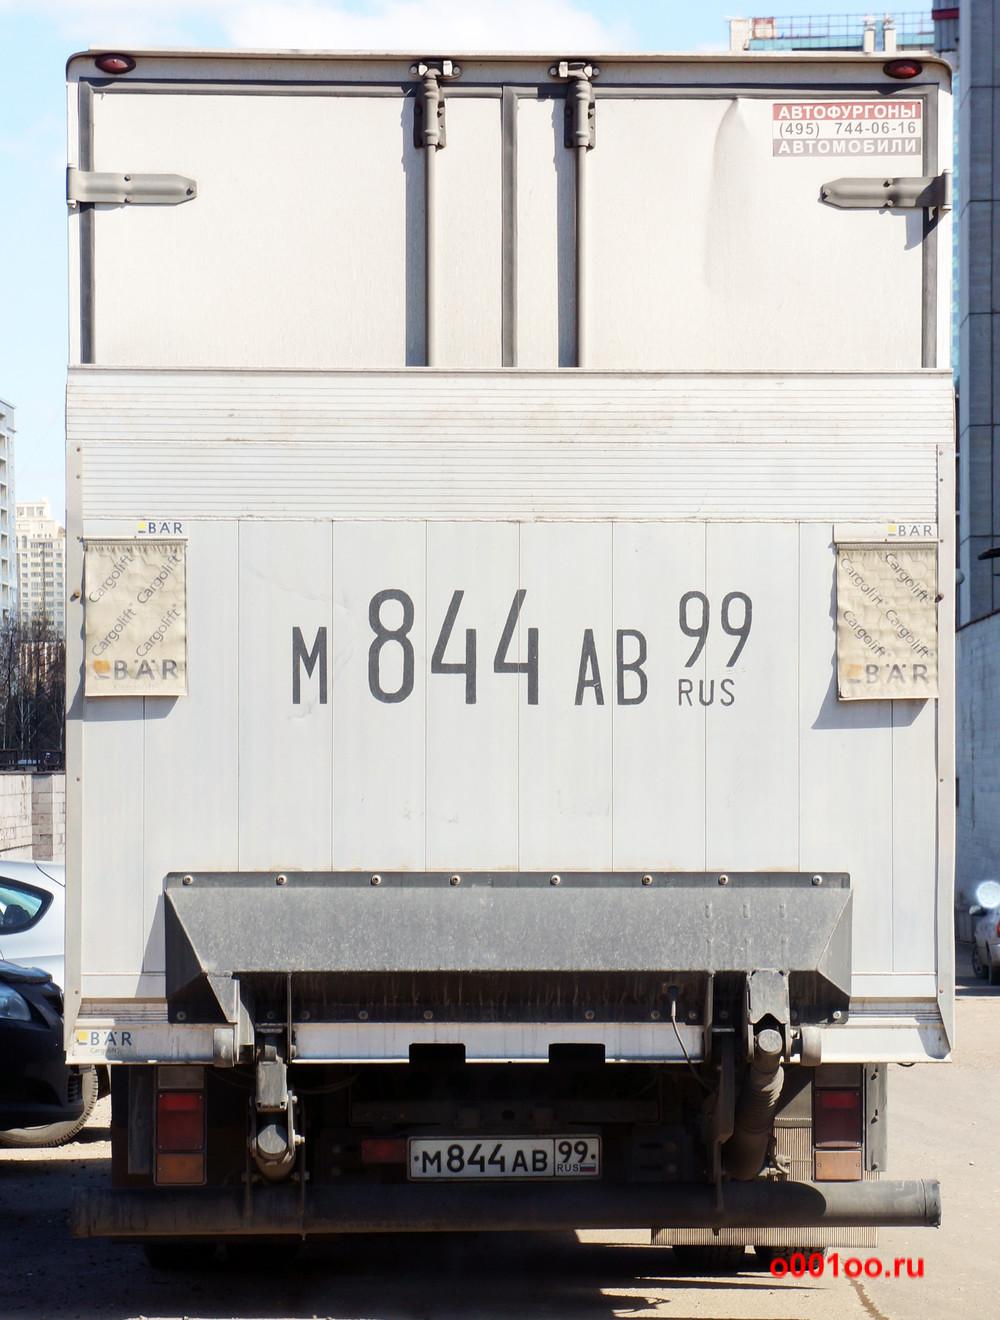 м844ав99